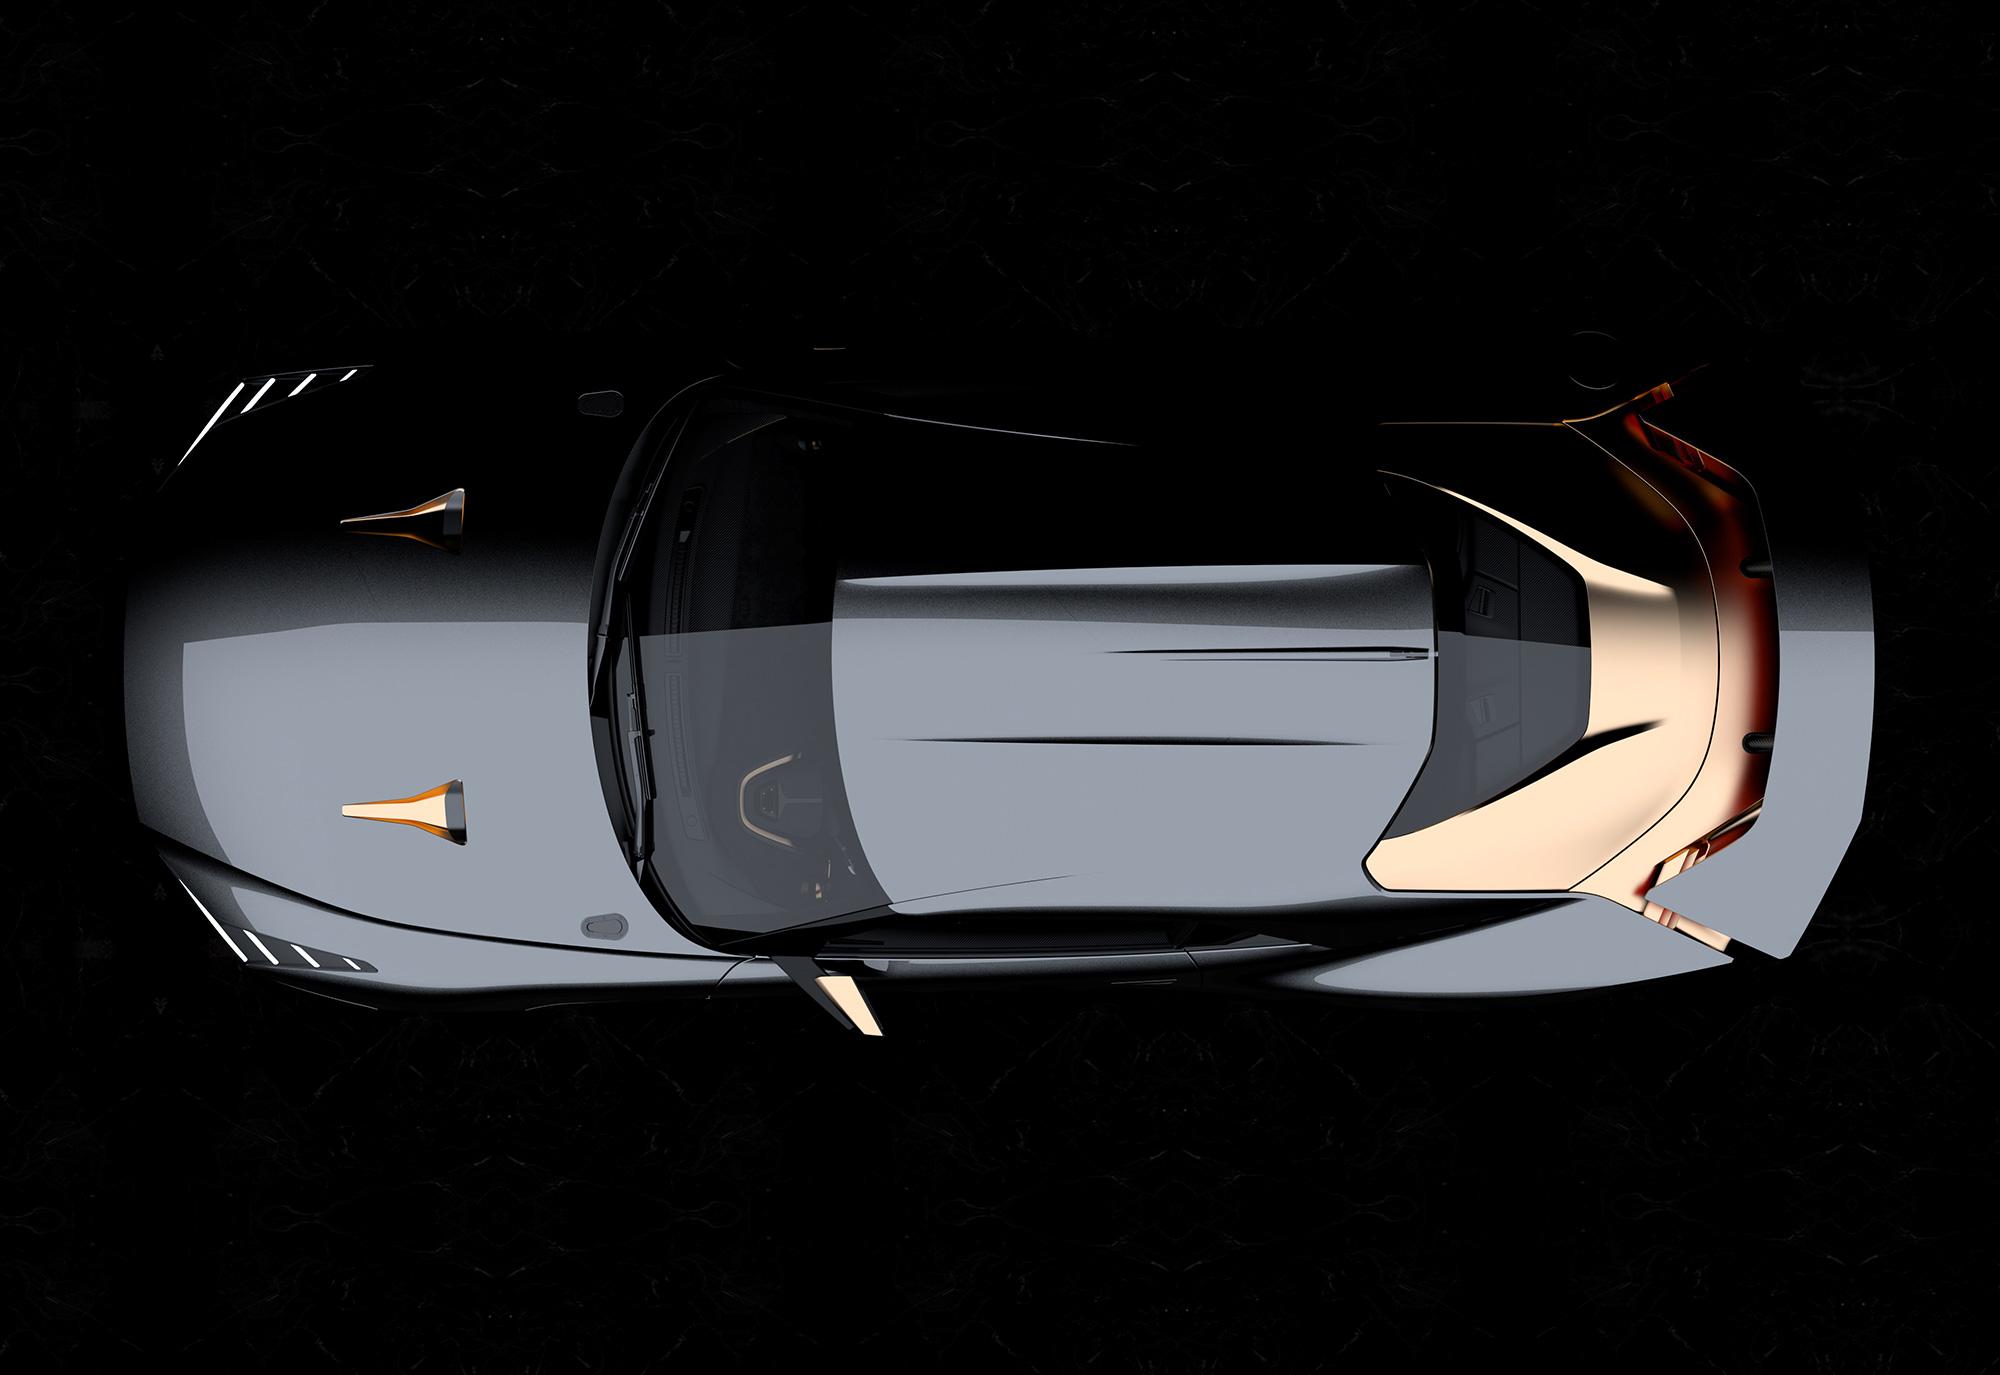 2018-06-25-Nissan-GT-R50-by-Italdesign-EXTERIOR-IMAGE-9.jpg